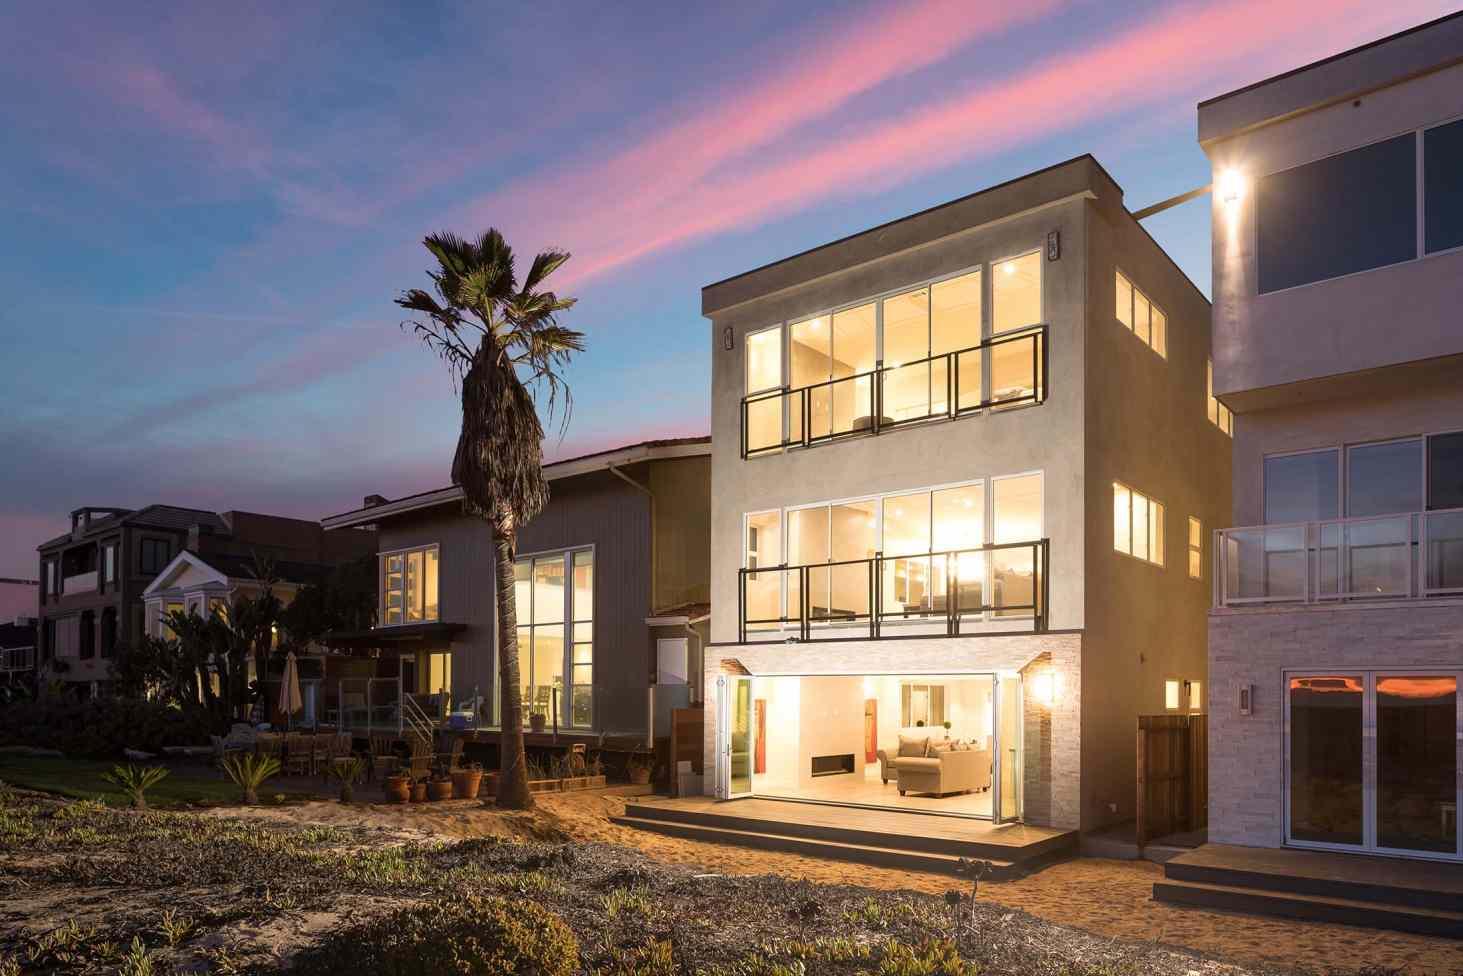 16467 South Pacific Avenue | Sunset Beach, CA